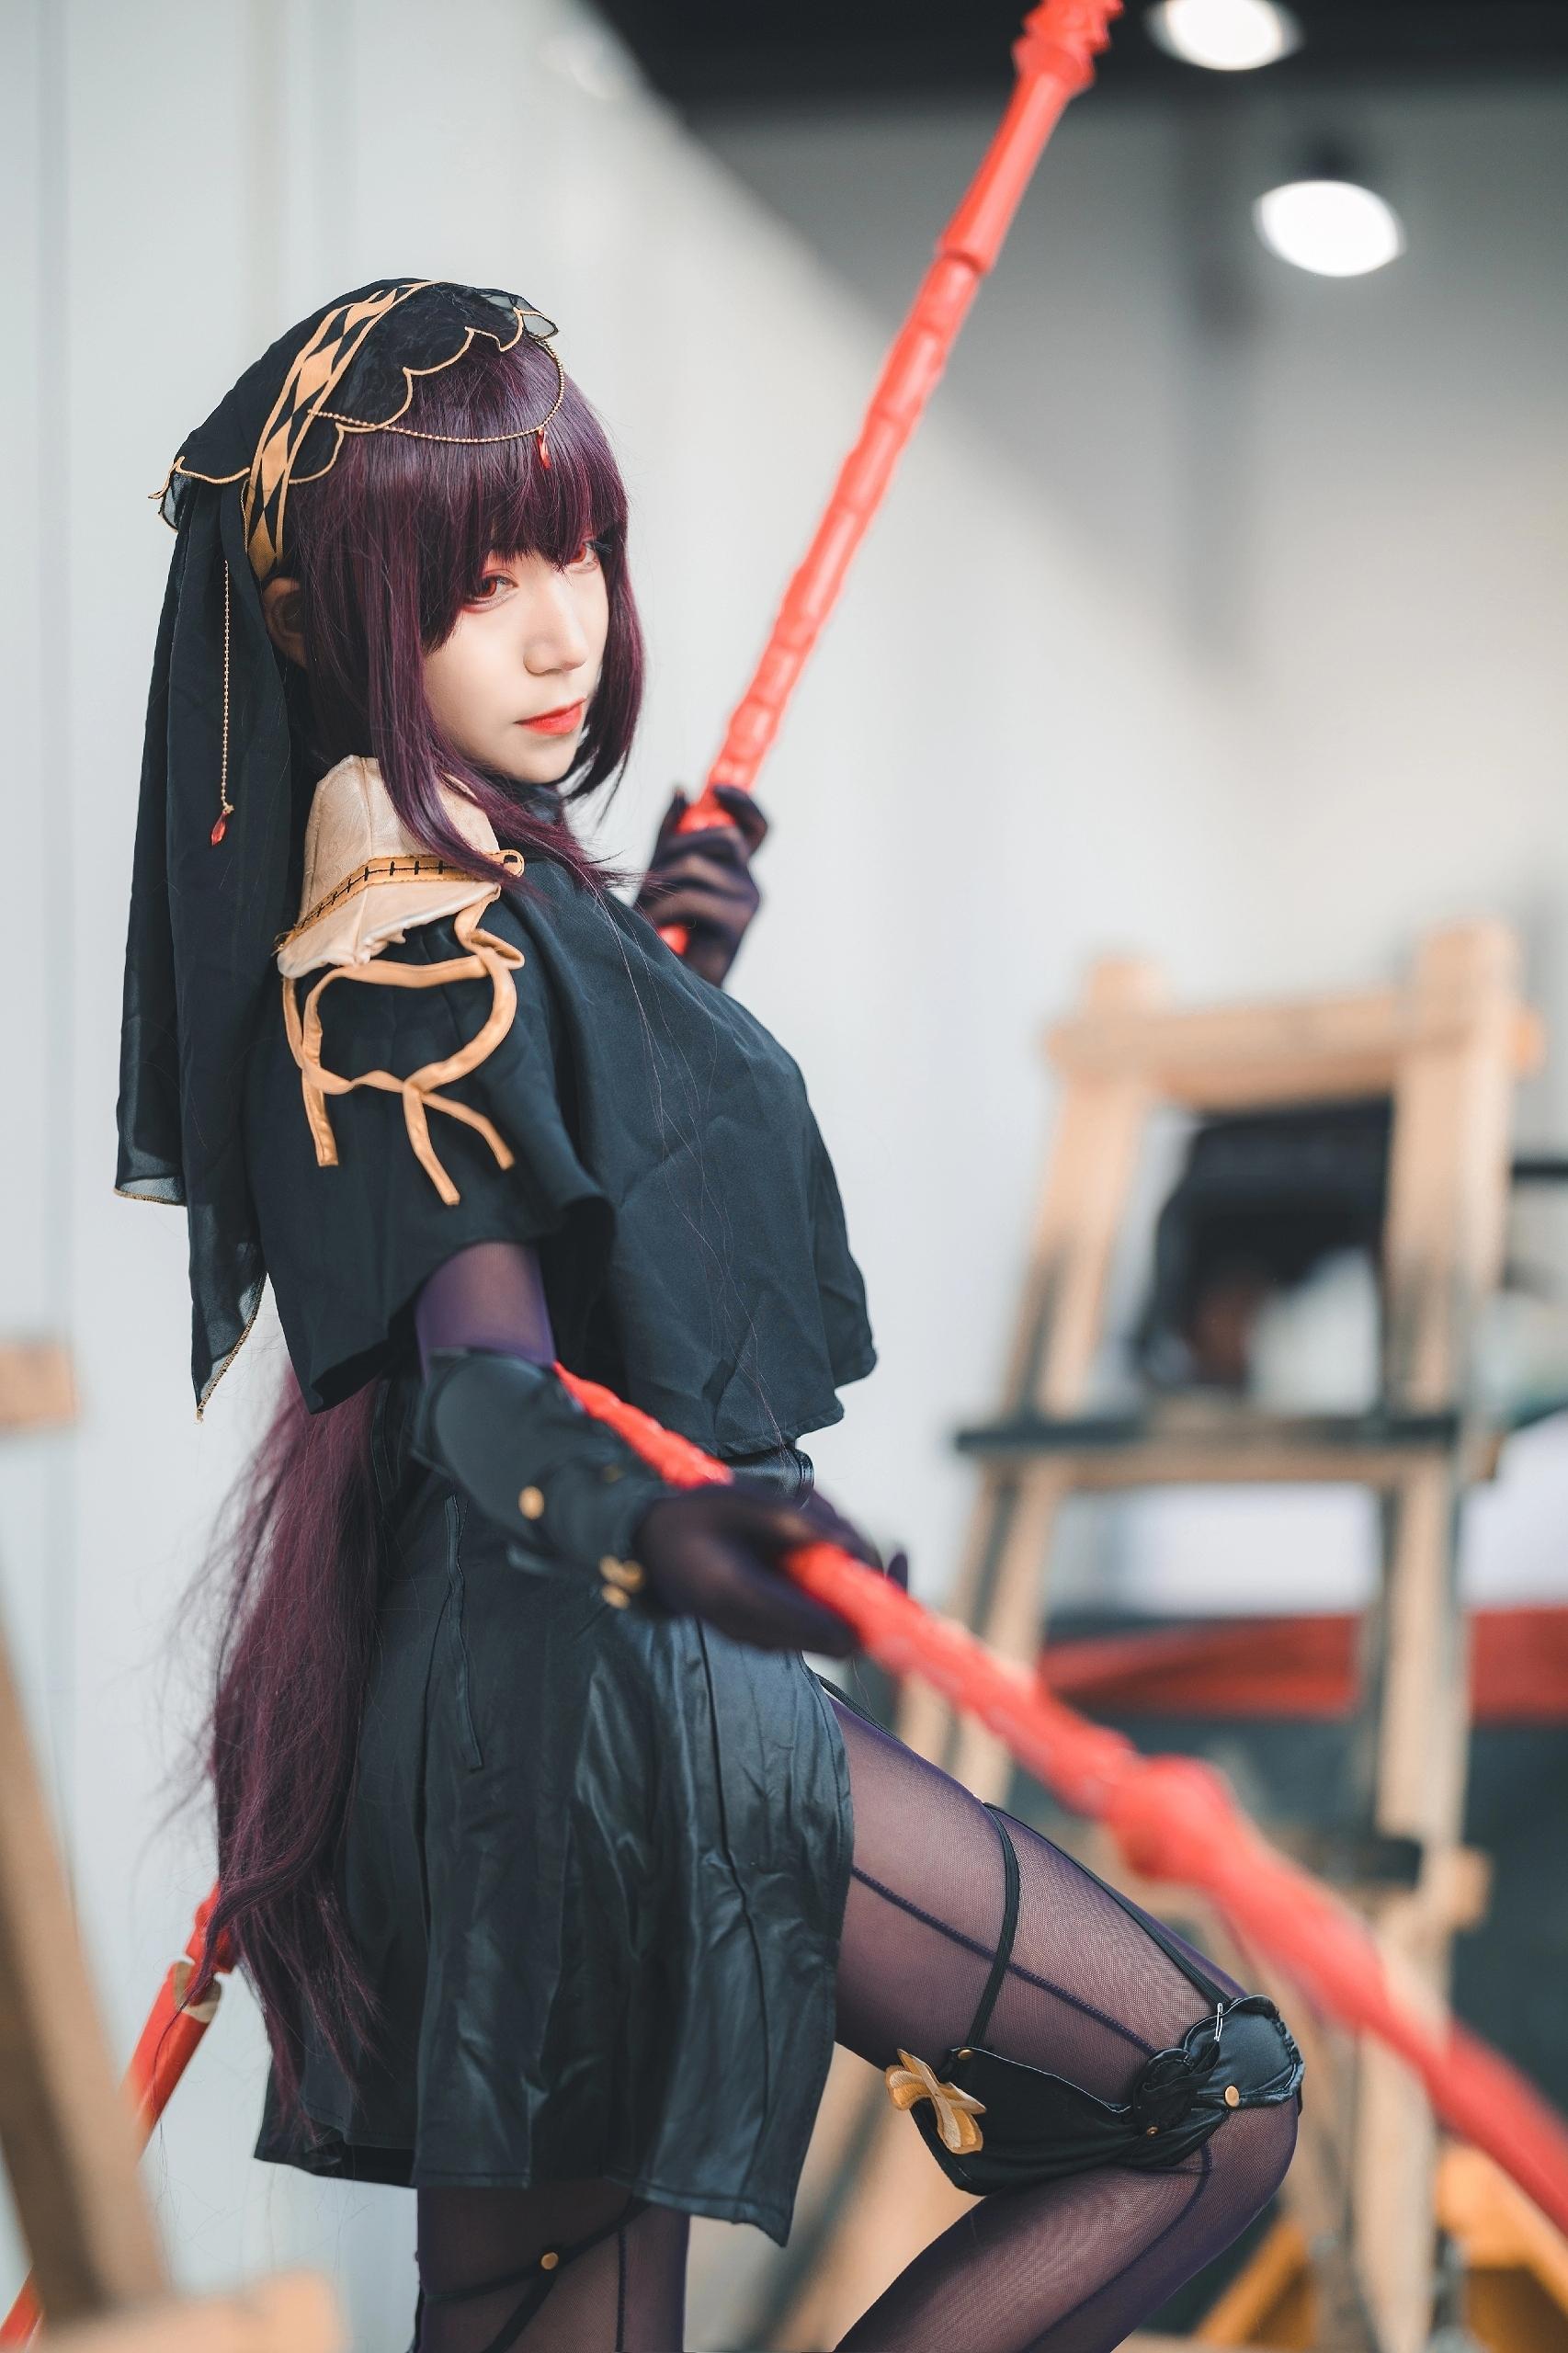 《FATE/GRAND ORDER》漫展cosplay【CN:COSER赤瞳_菌】-第1张